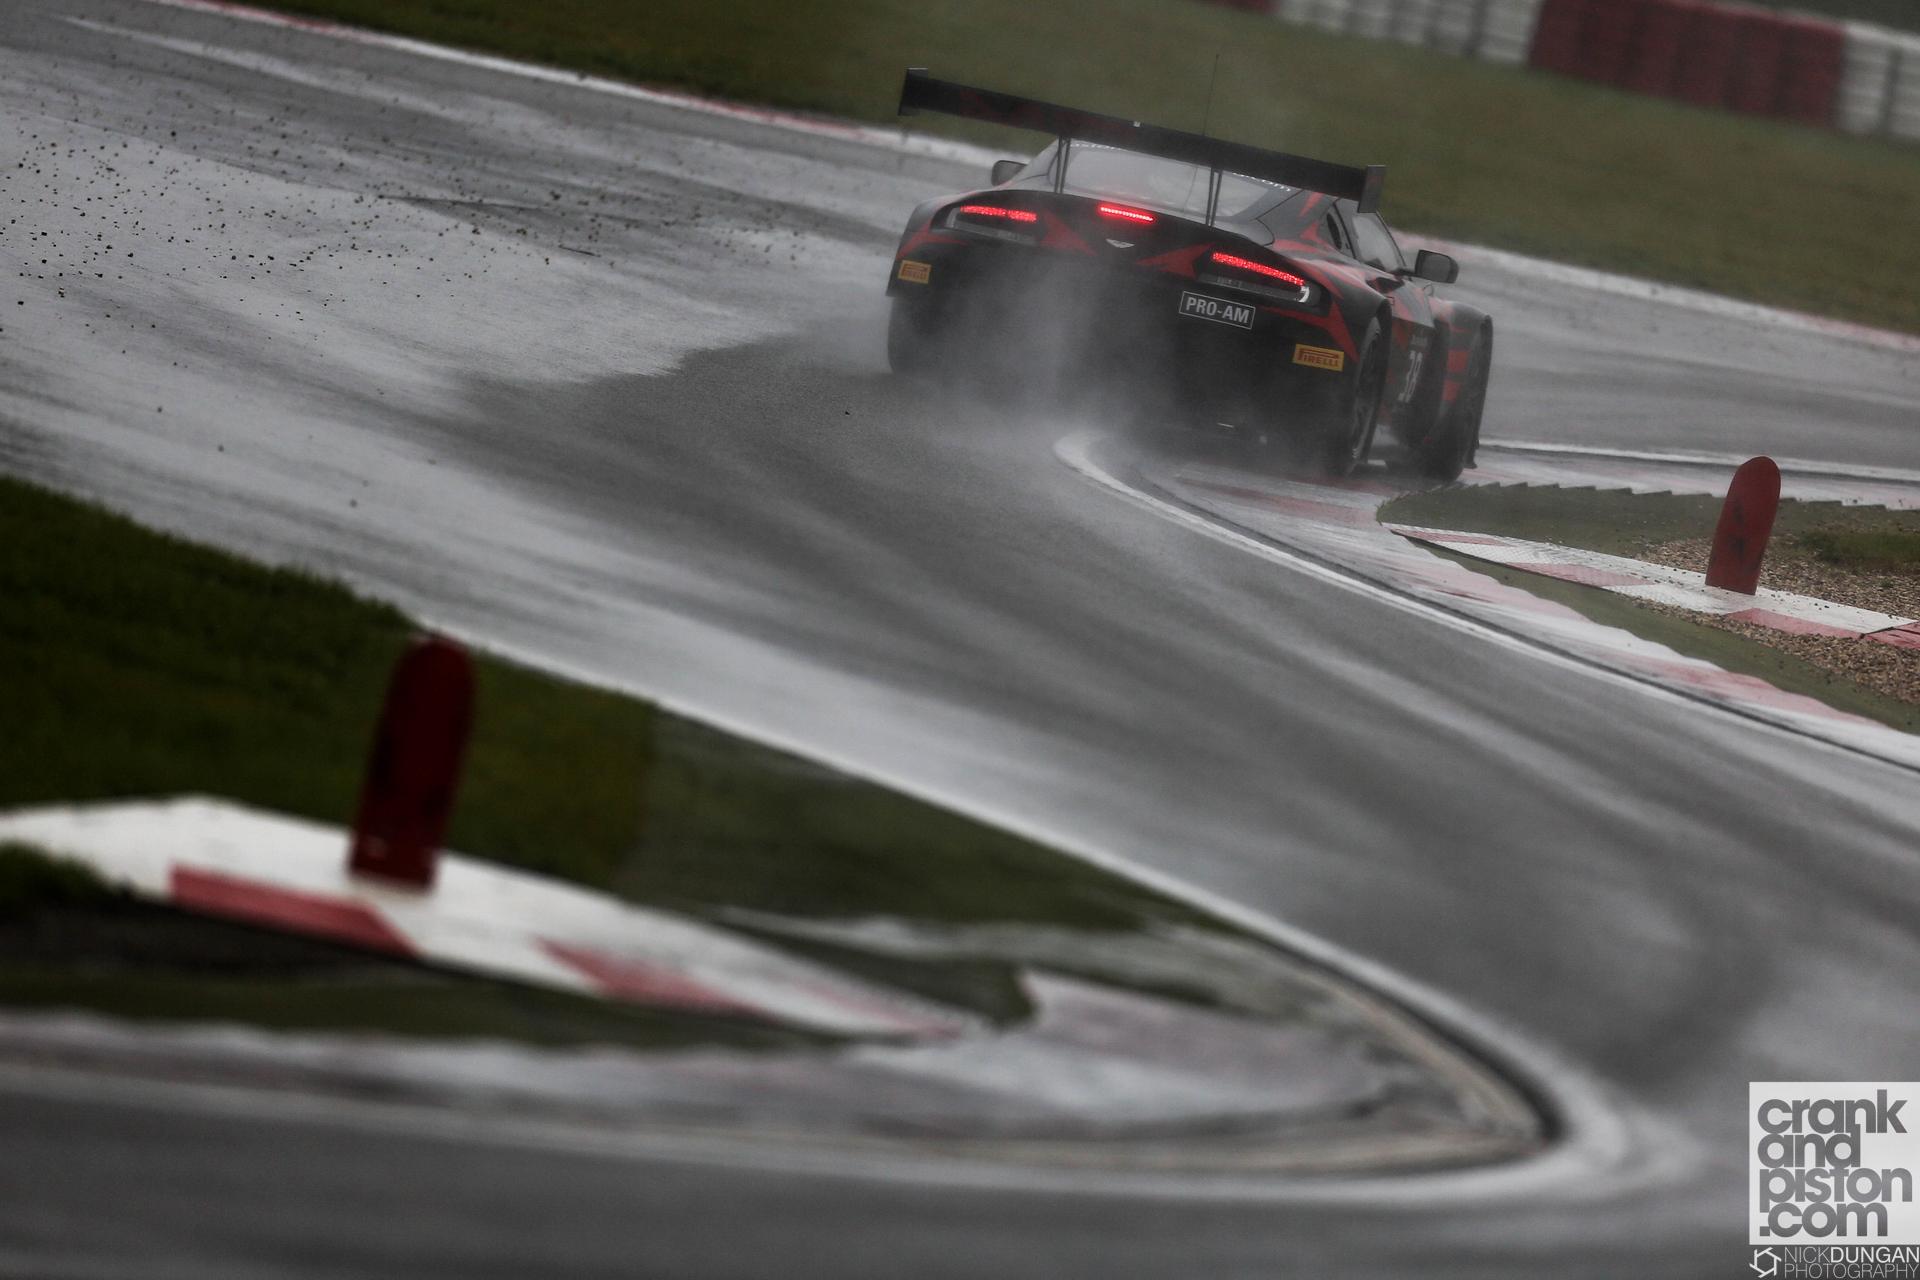 Richard Abra, Mark Poole, Joe Osborne MP Motorsport AMR Aston Martin Vantage GT3 - Blancpain i-Racing N¸rburgring 1000 at N¸rburgring -  - Germany